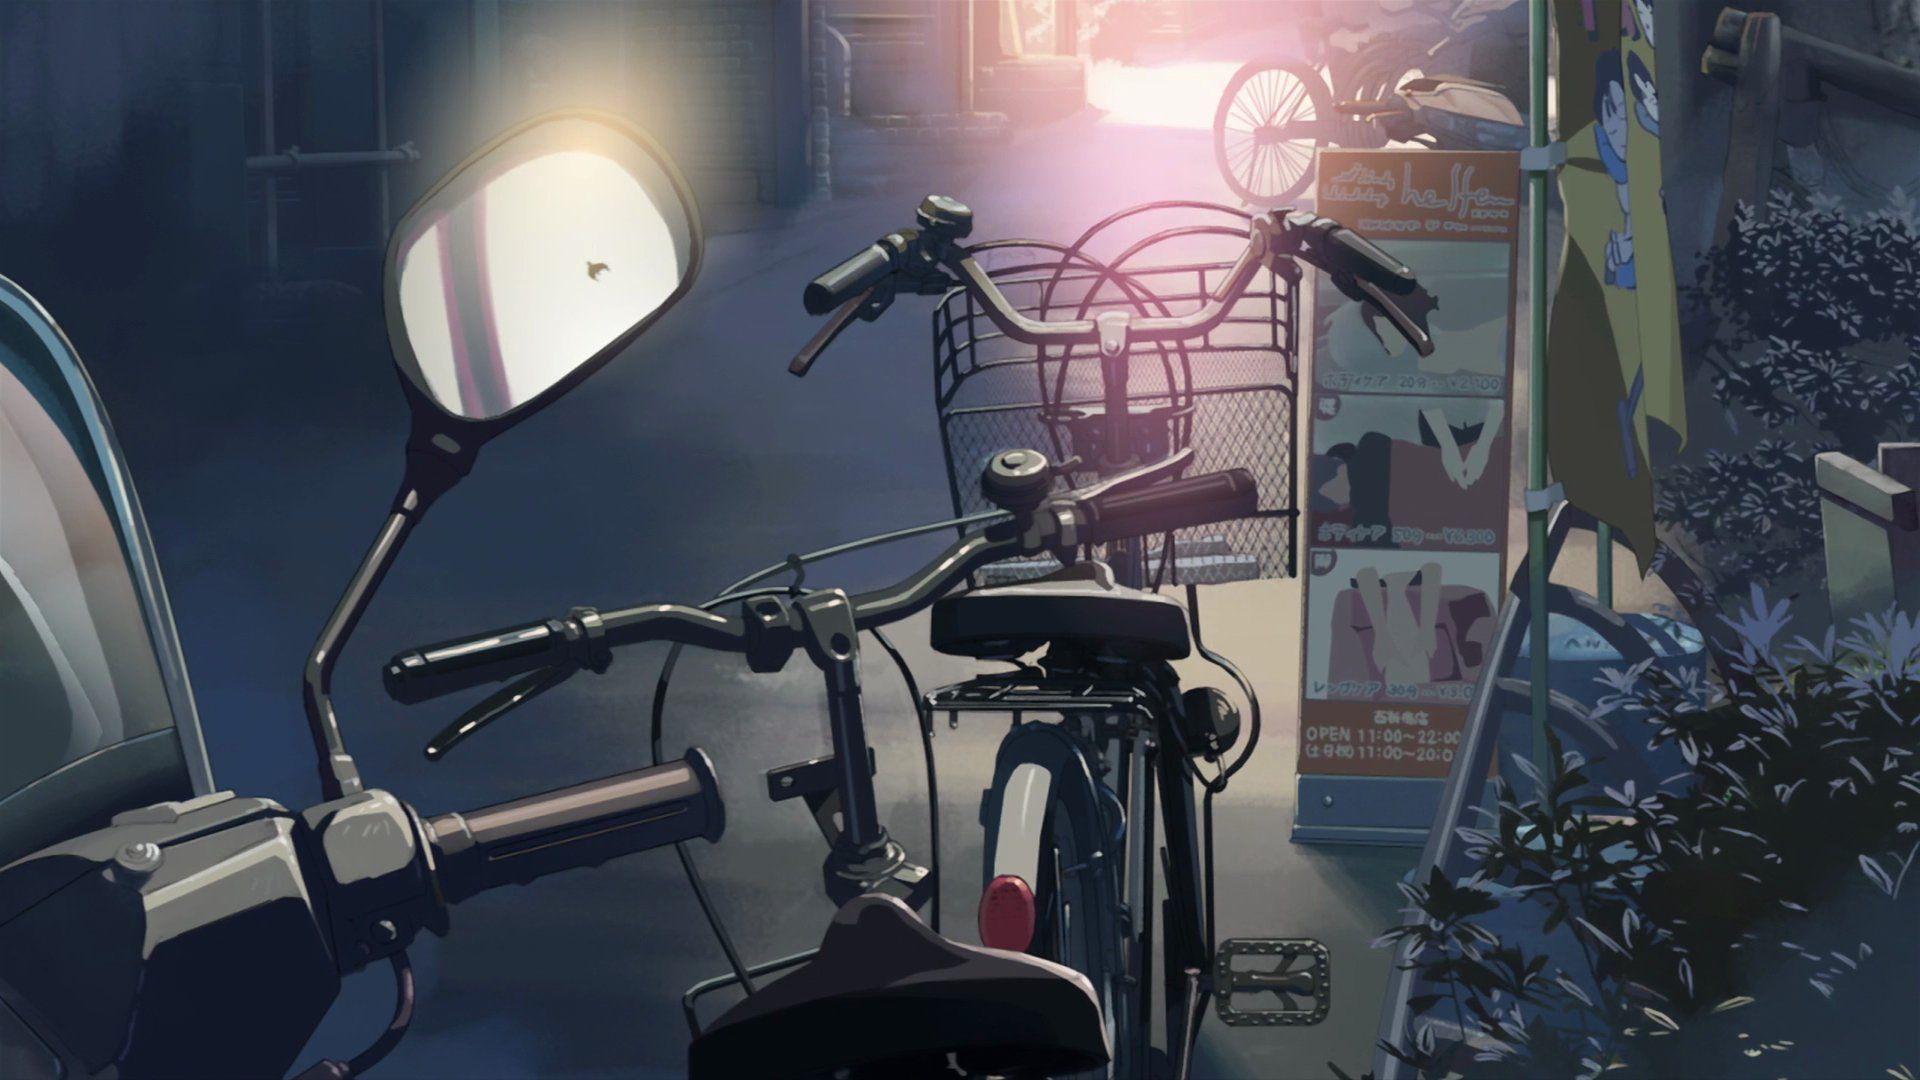 Aesthetic Anime Desktop Wallpapers - Top Free Aesthetic ...